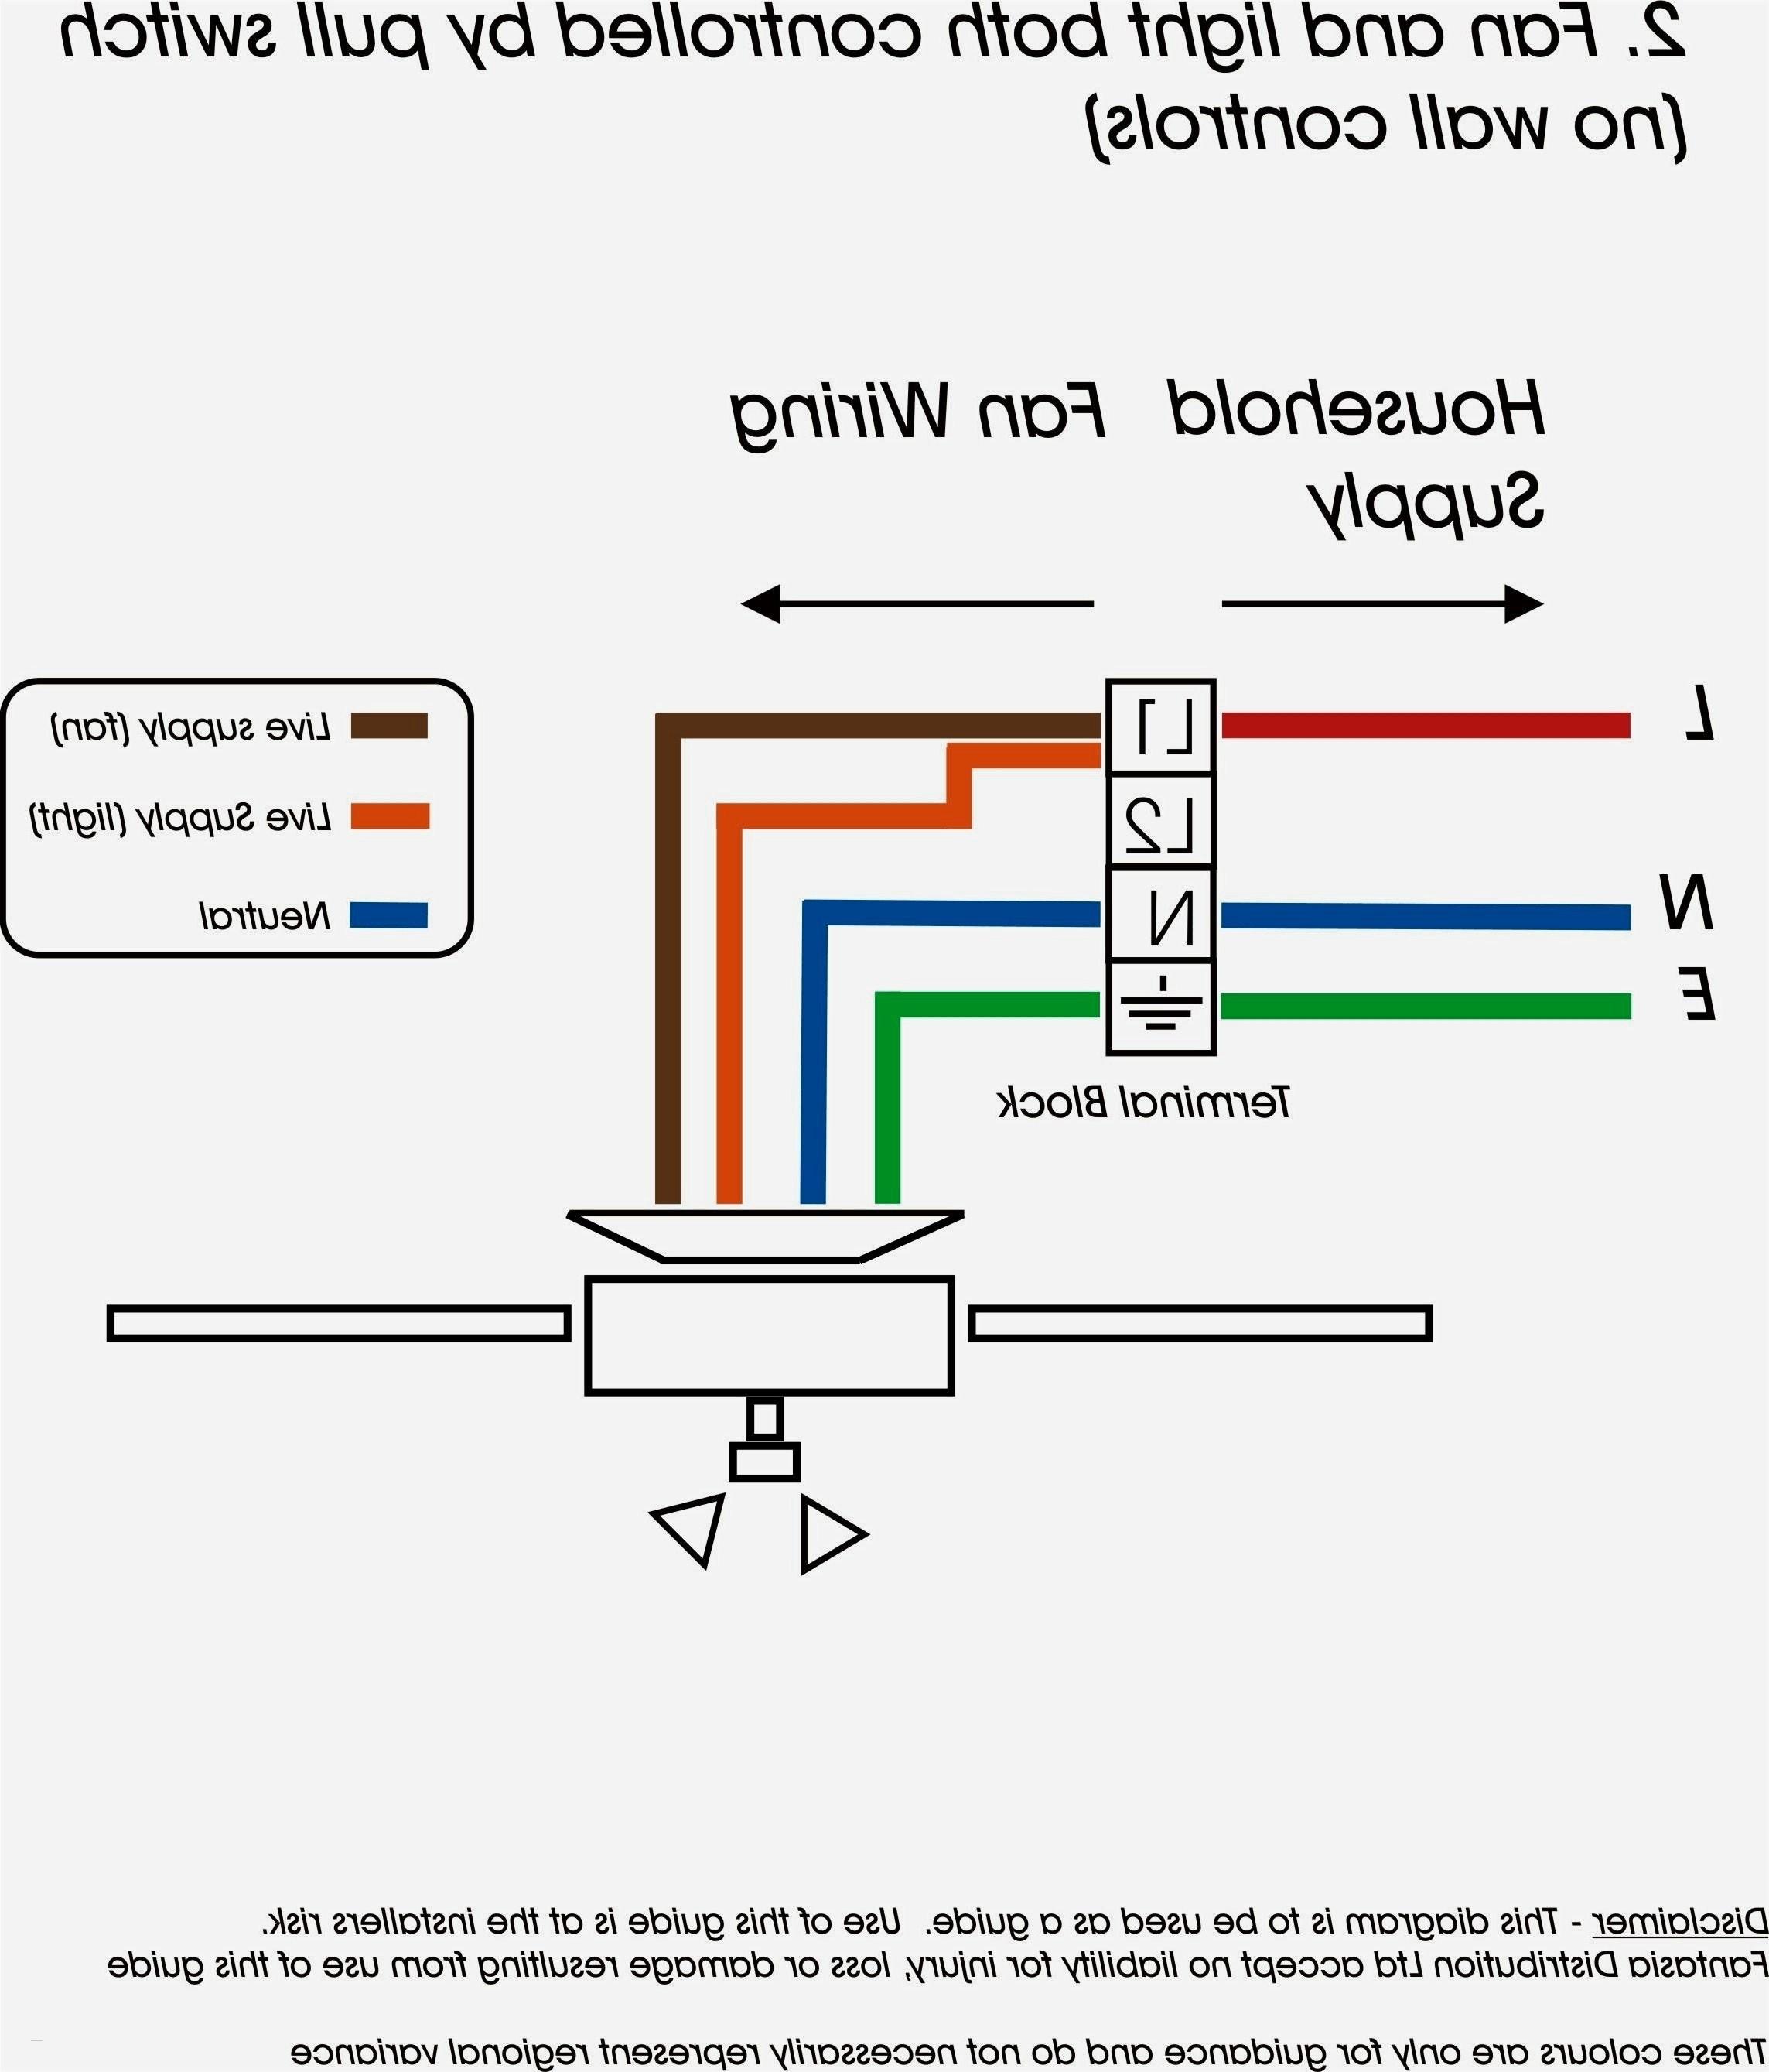 leviton switch wiring diagram Download-Electrical Wire Diagram Download Leviton Single Pole Switch Pilot Light Wiring Diagram Electrical 10-o